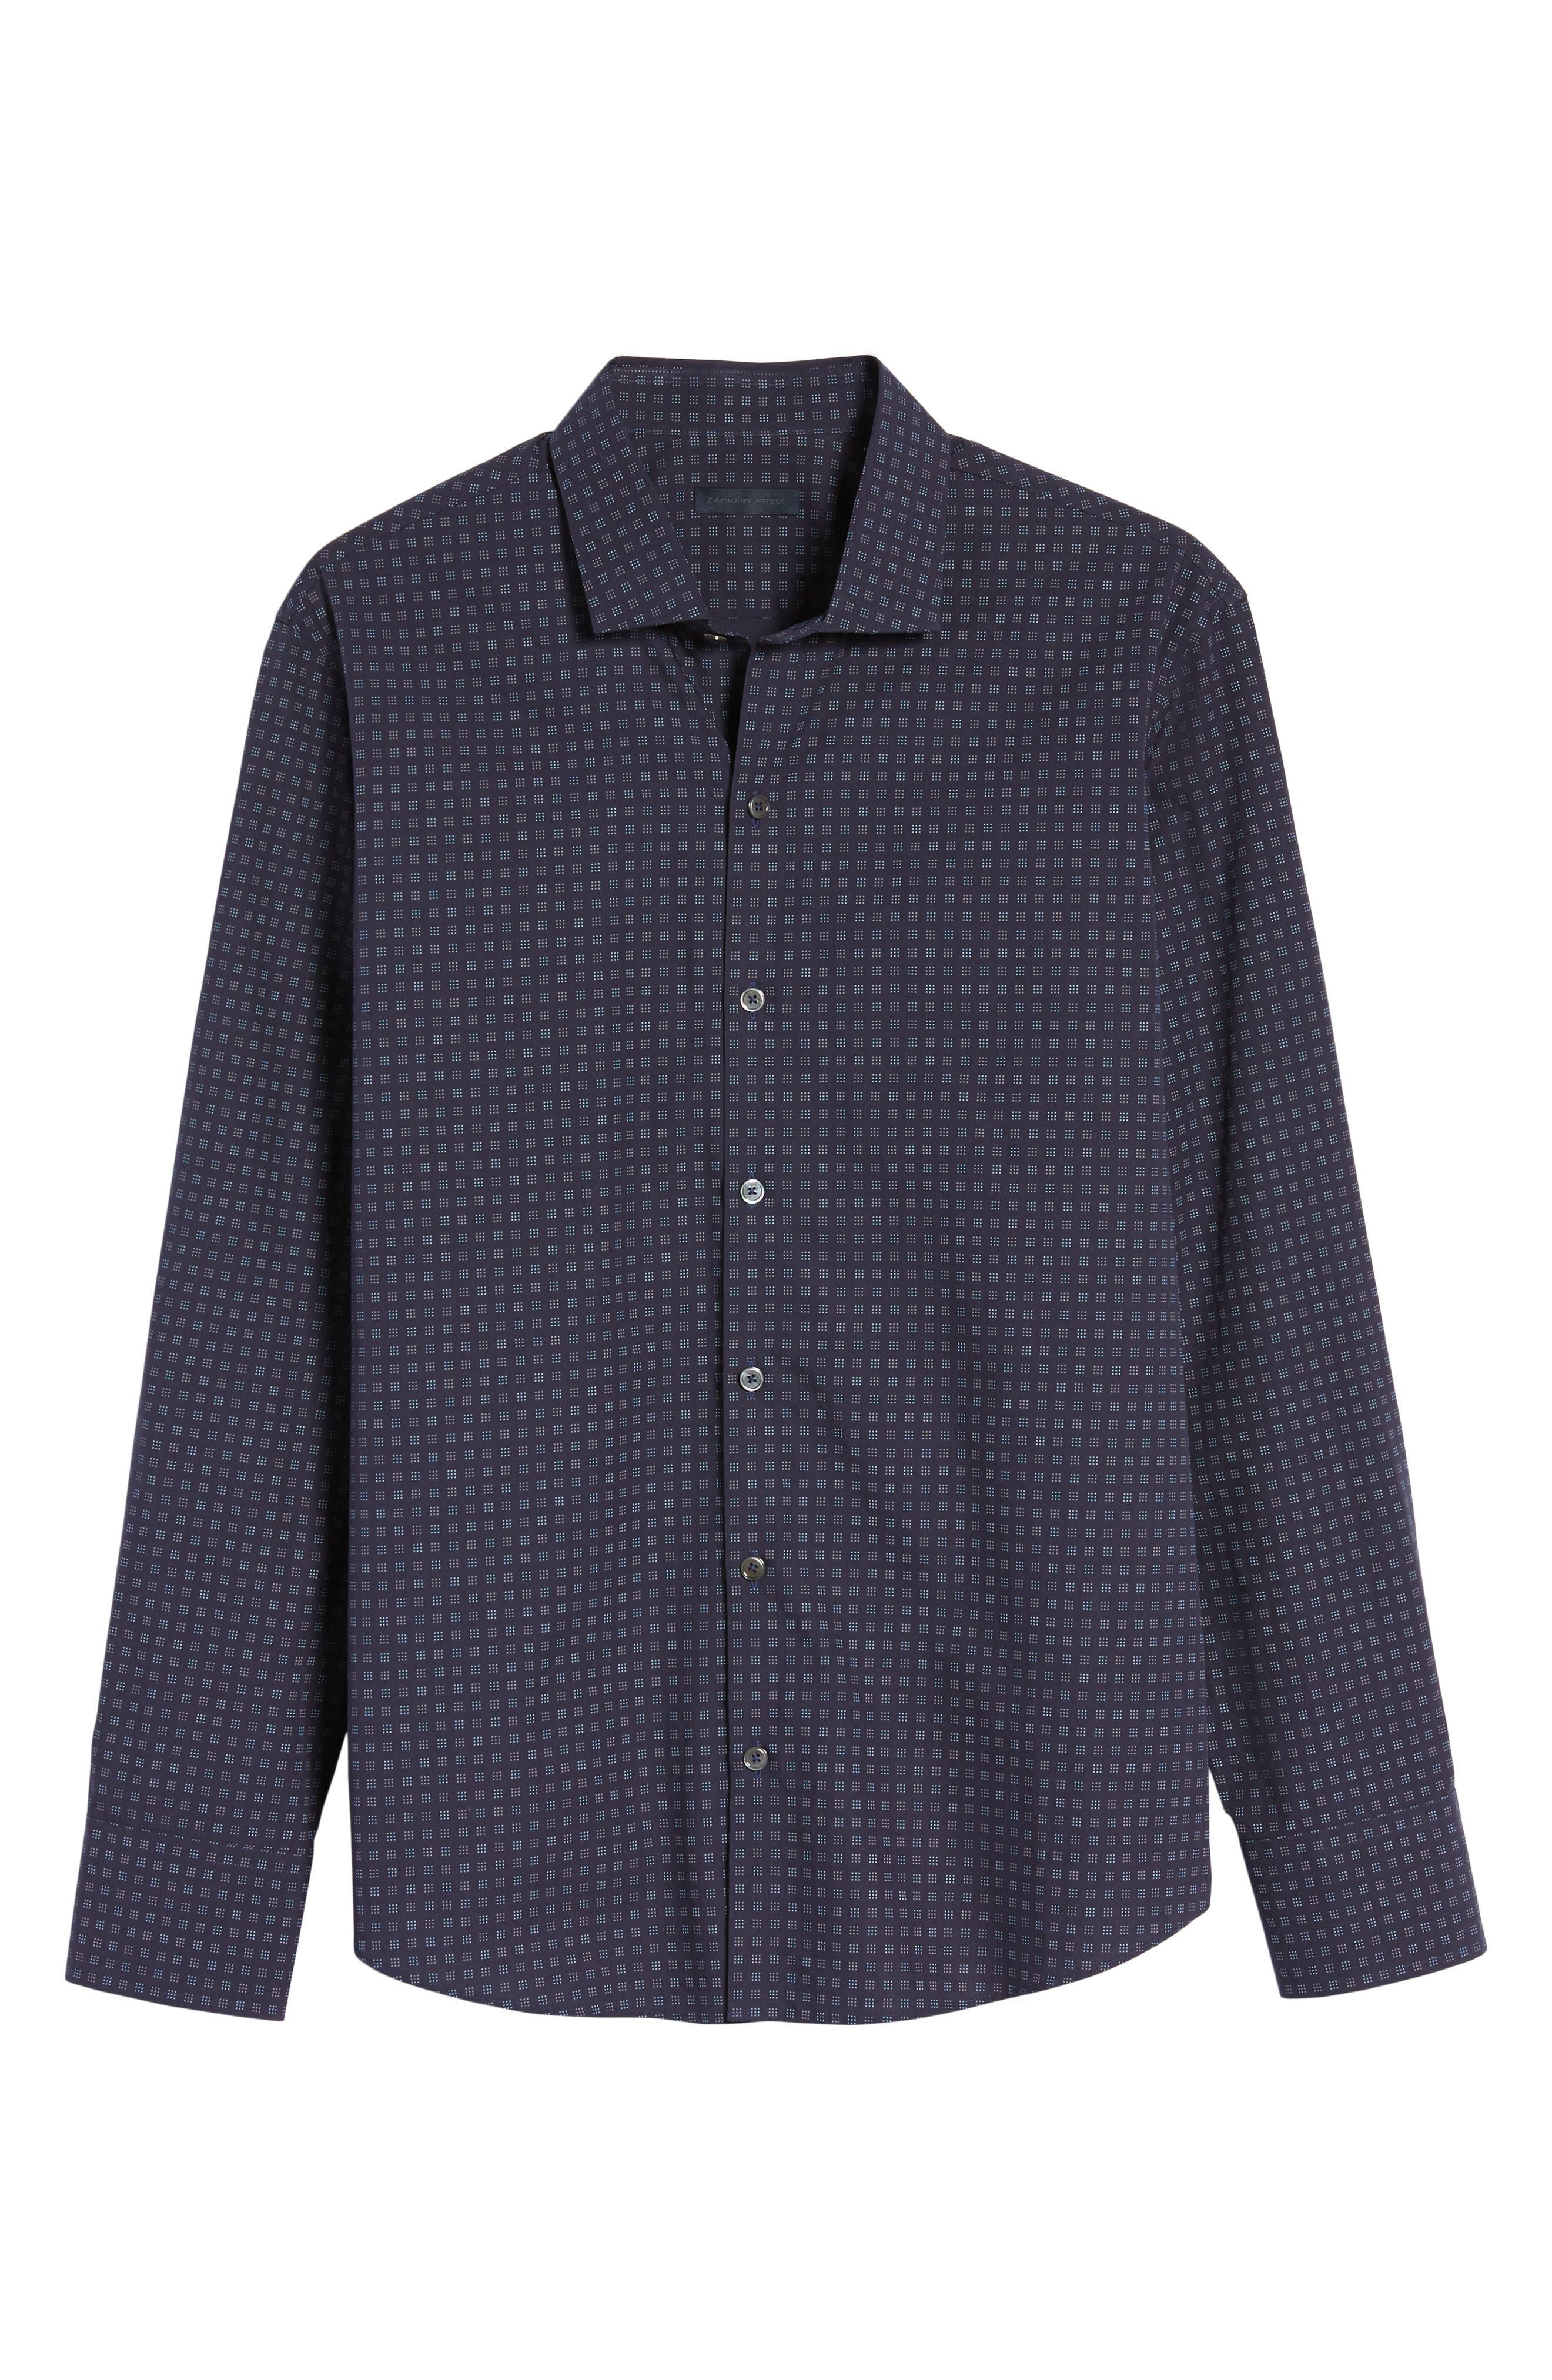 Maison Slim Fit Print Sport Shirt,                             Alternate thumbnail 6, color,                             Navy